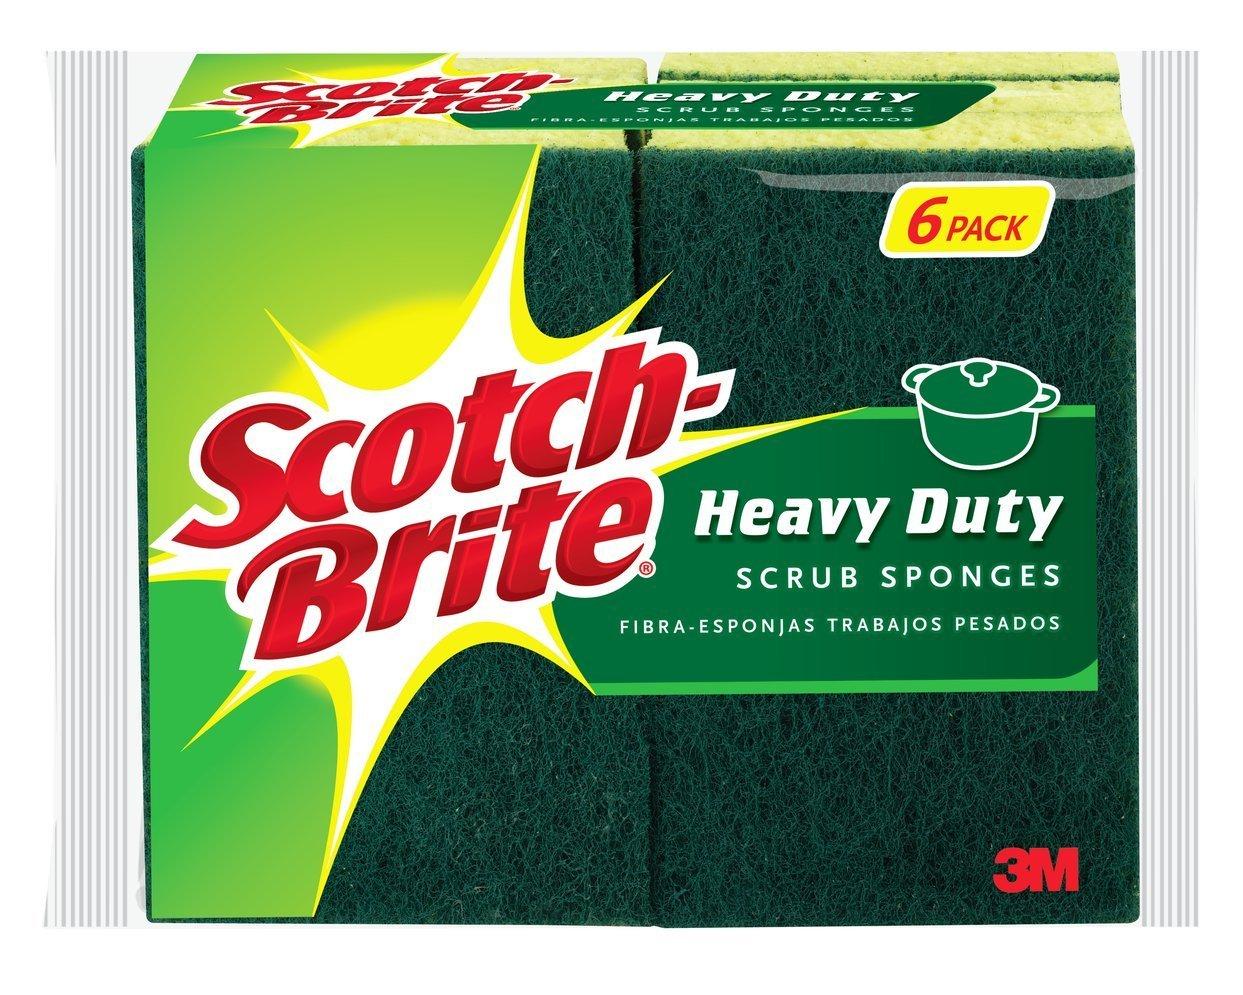 Prime Members: 6-Count Scotch Brite Heavy Duty Scrub Sponge  $2.60 + Free S/H